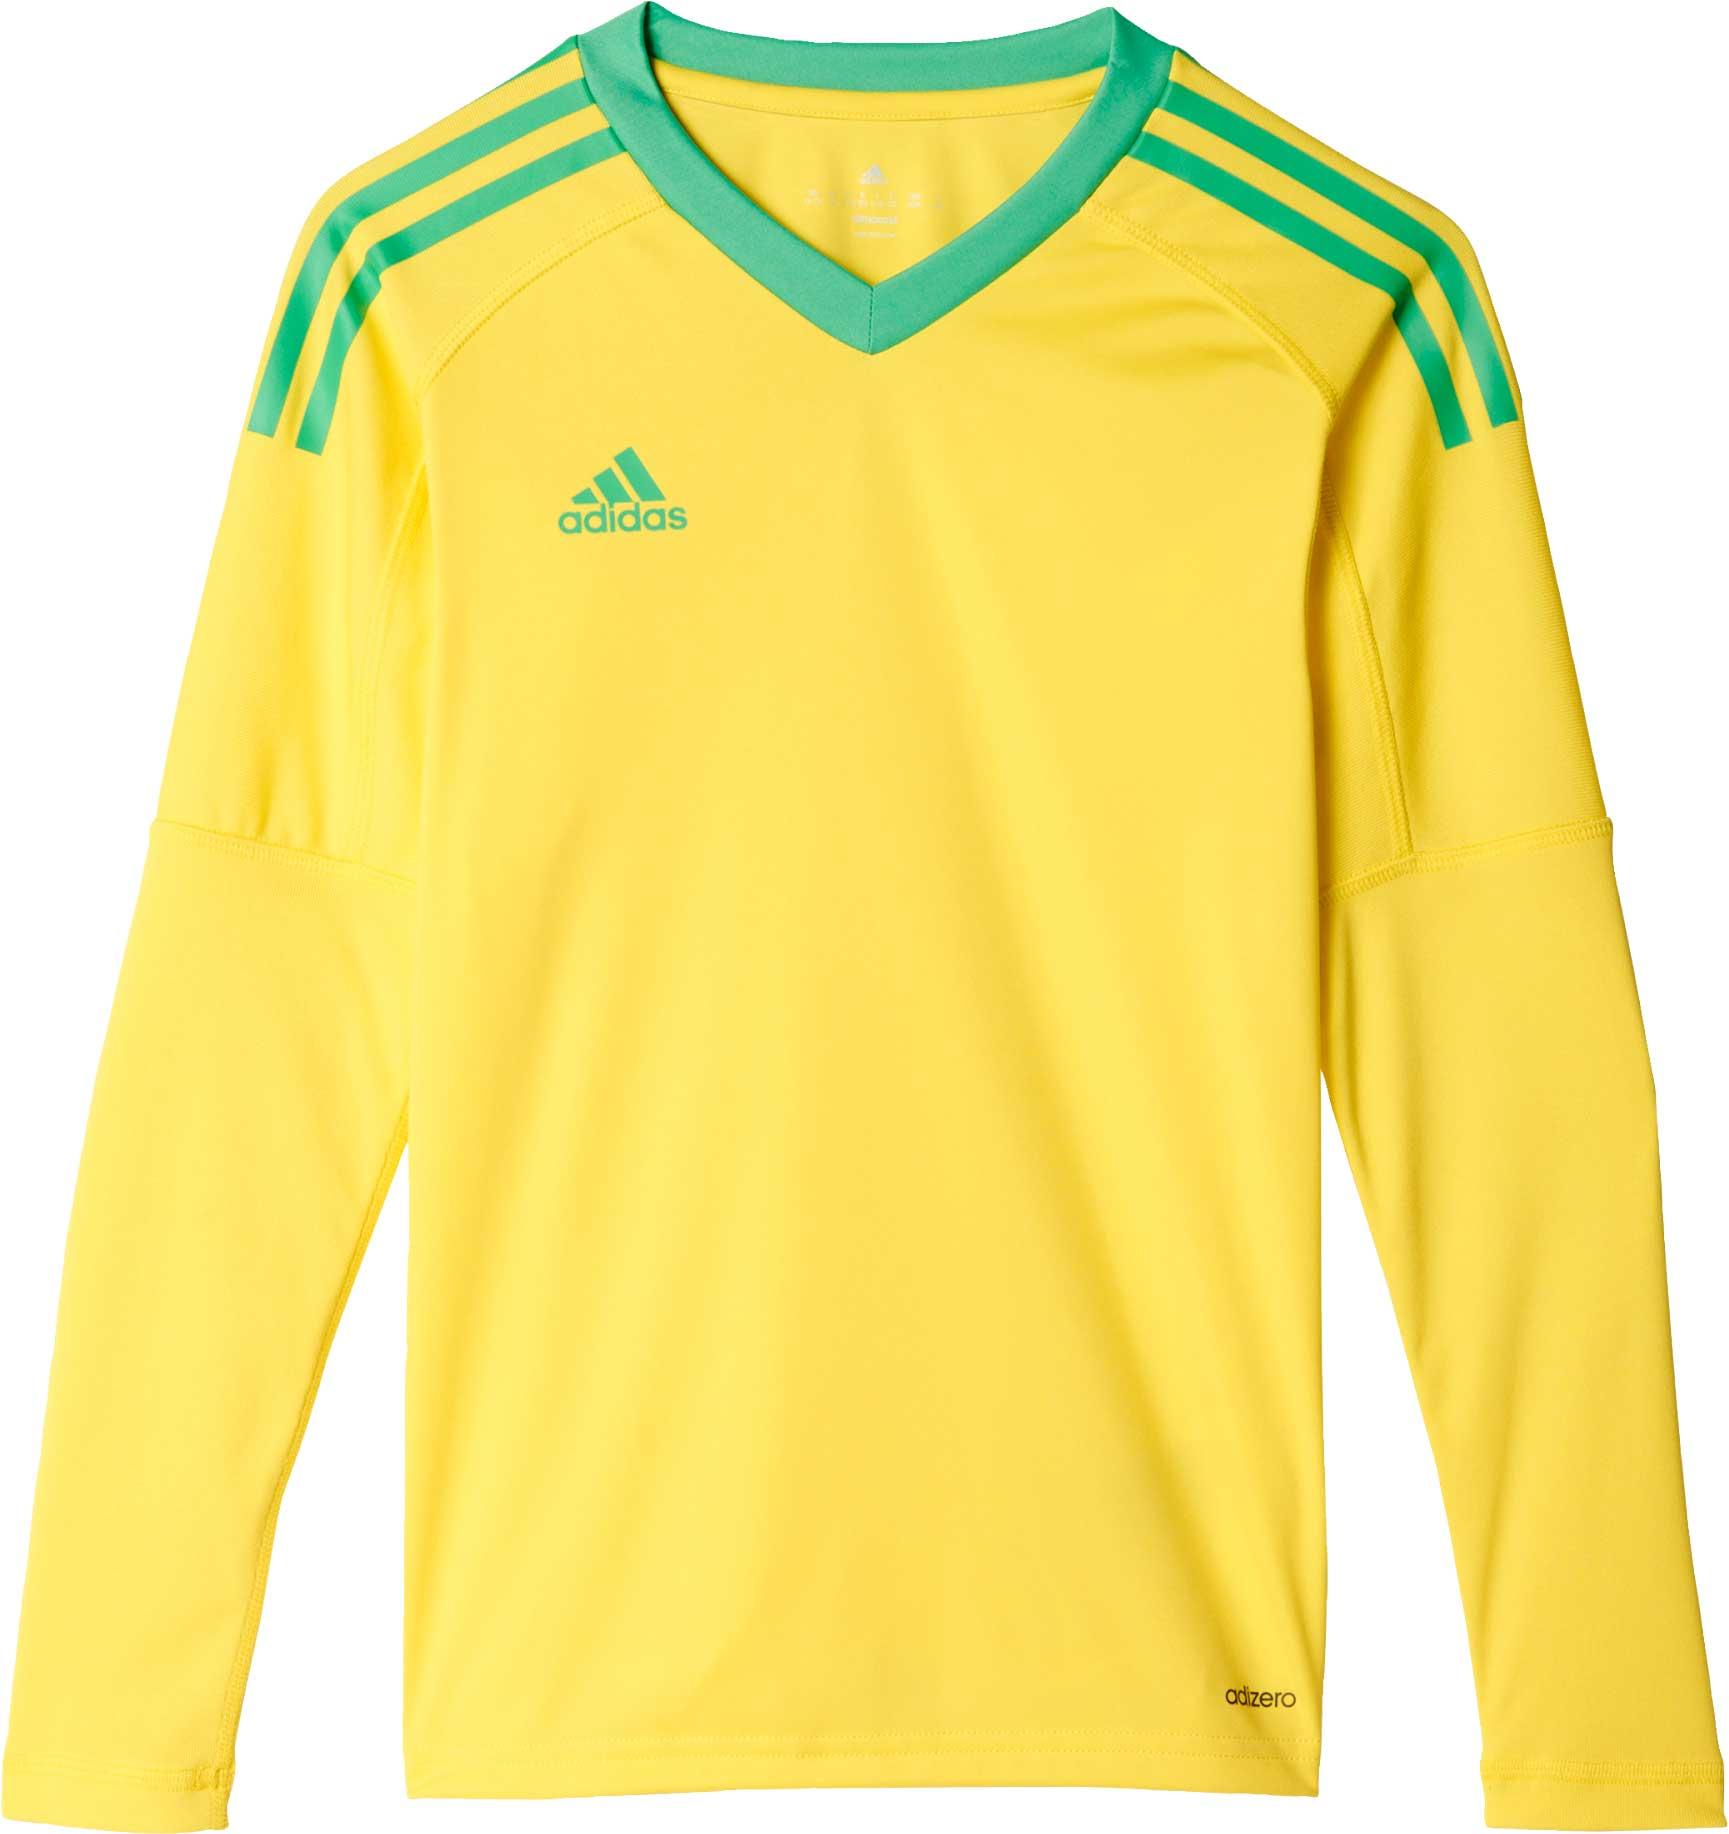 adidas Kids Revigo 17 Goalkeeper Jersey - Soccer Master